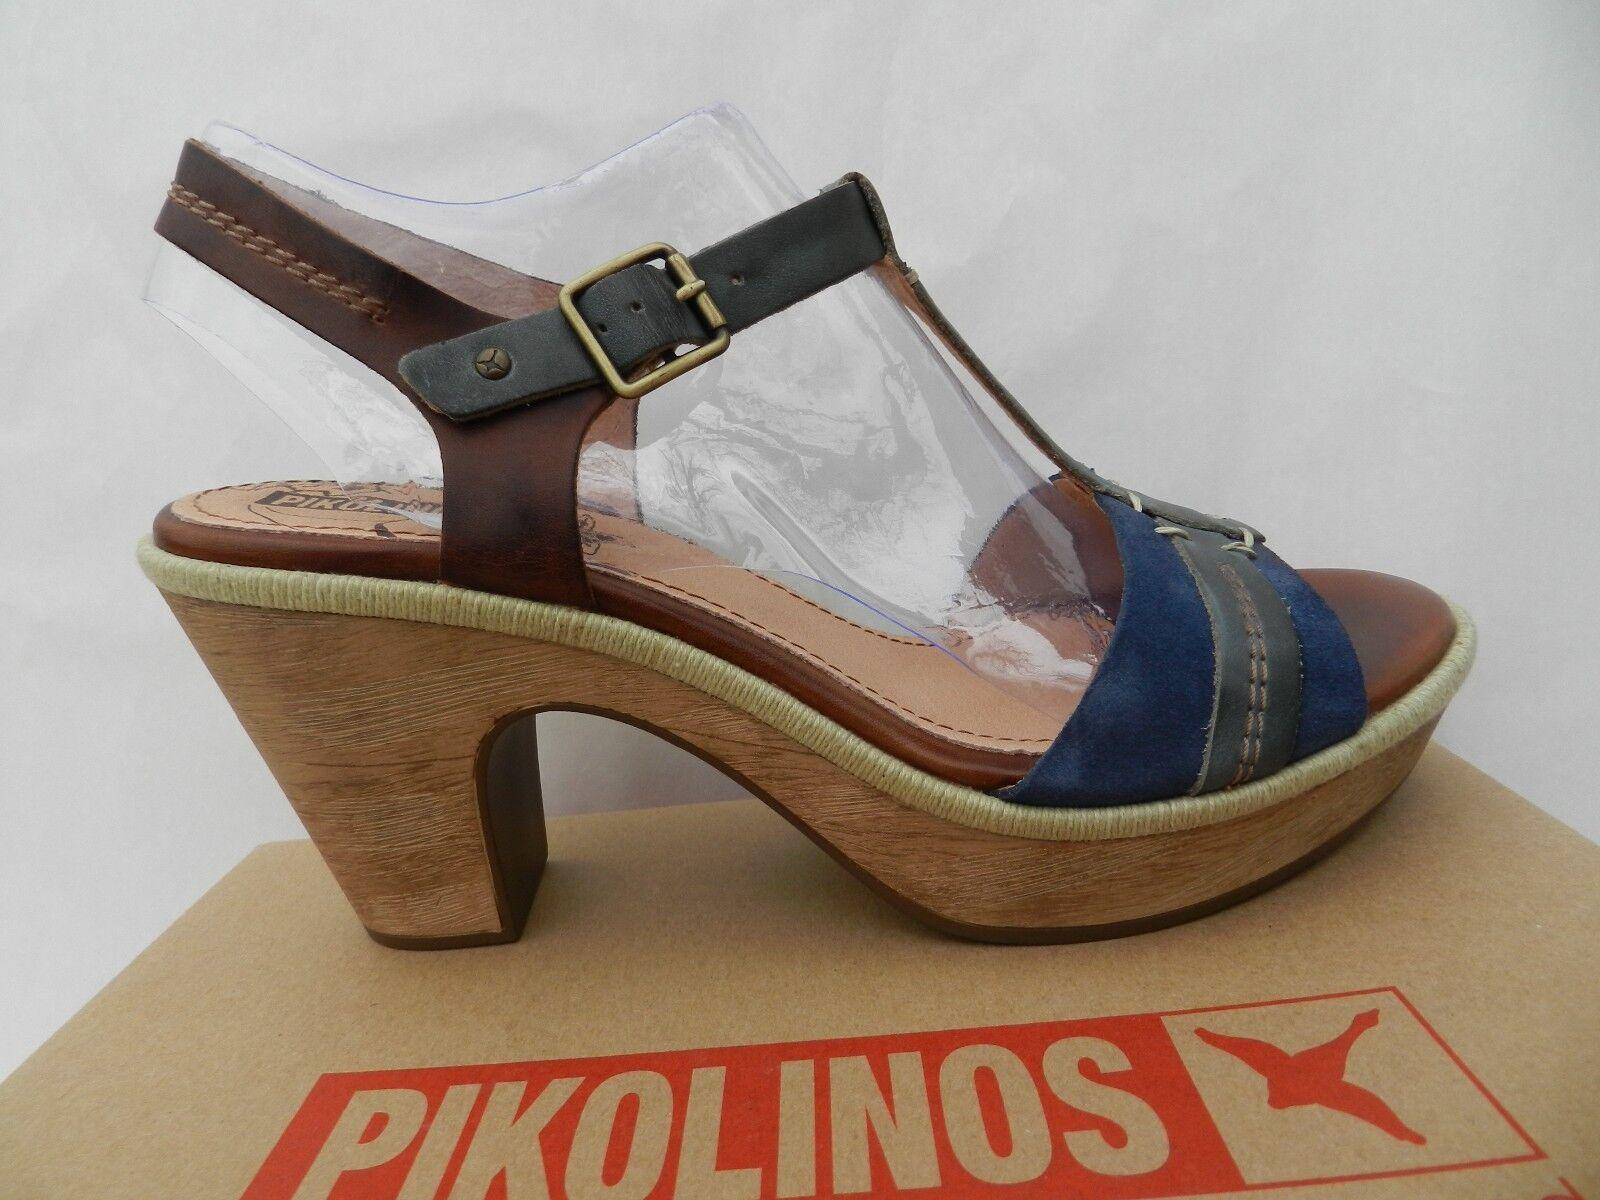 Pikolinos Trinidad 883 shoes Femme 41 Sandales T T T Strap 9614 Salome UK8 Neuf de767b